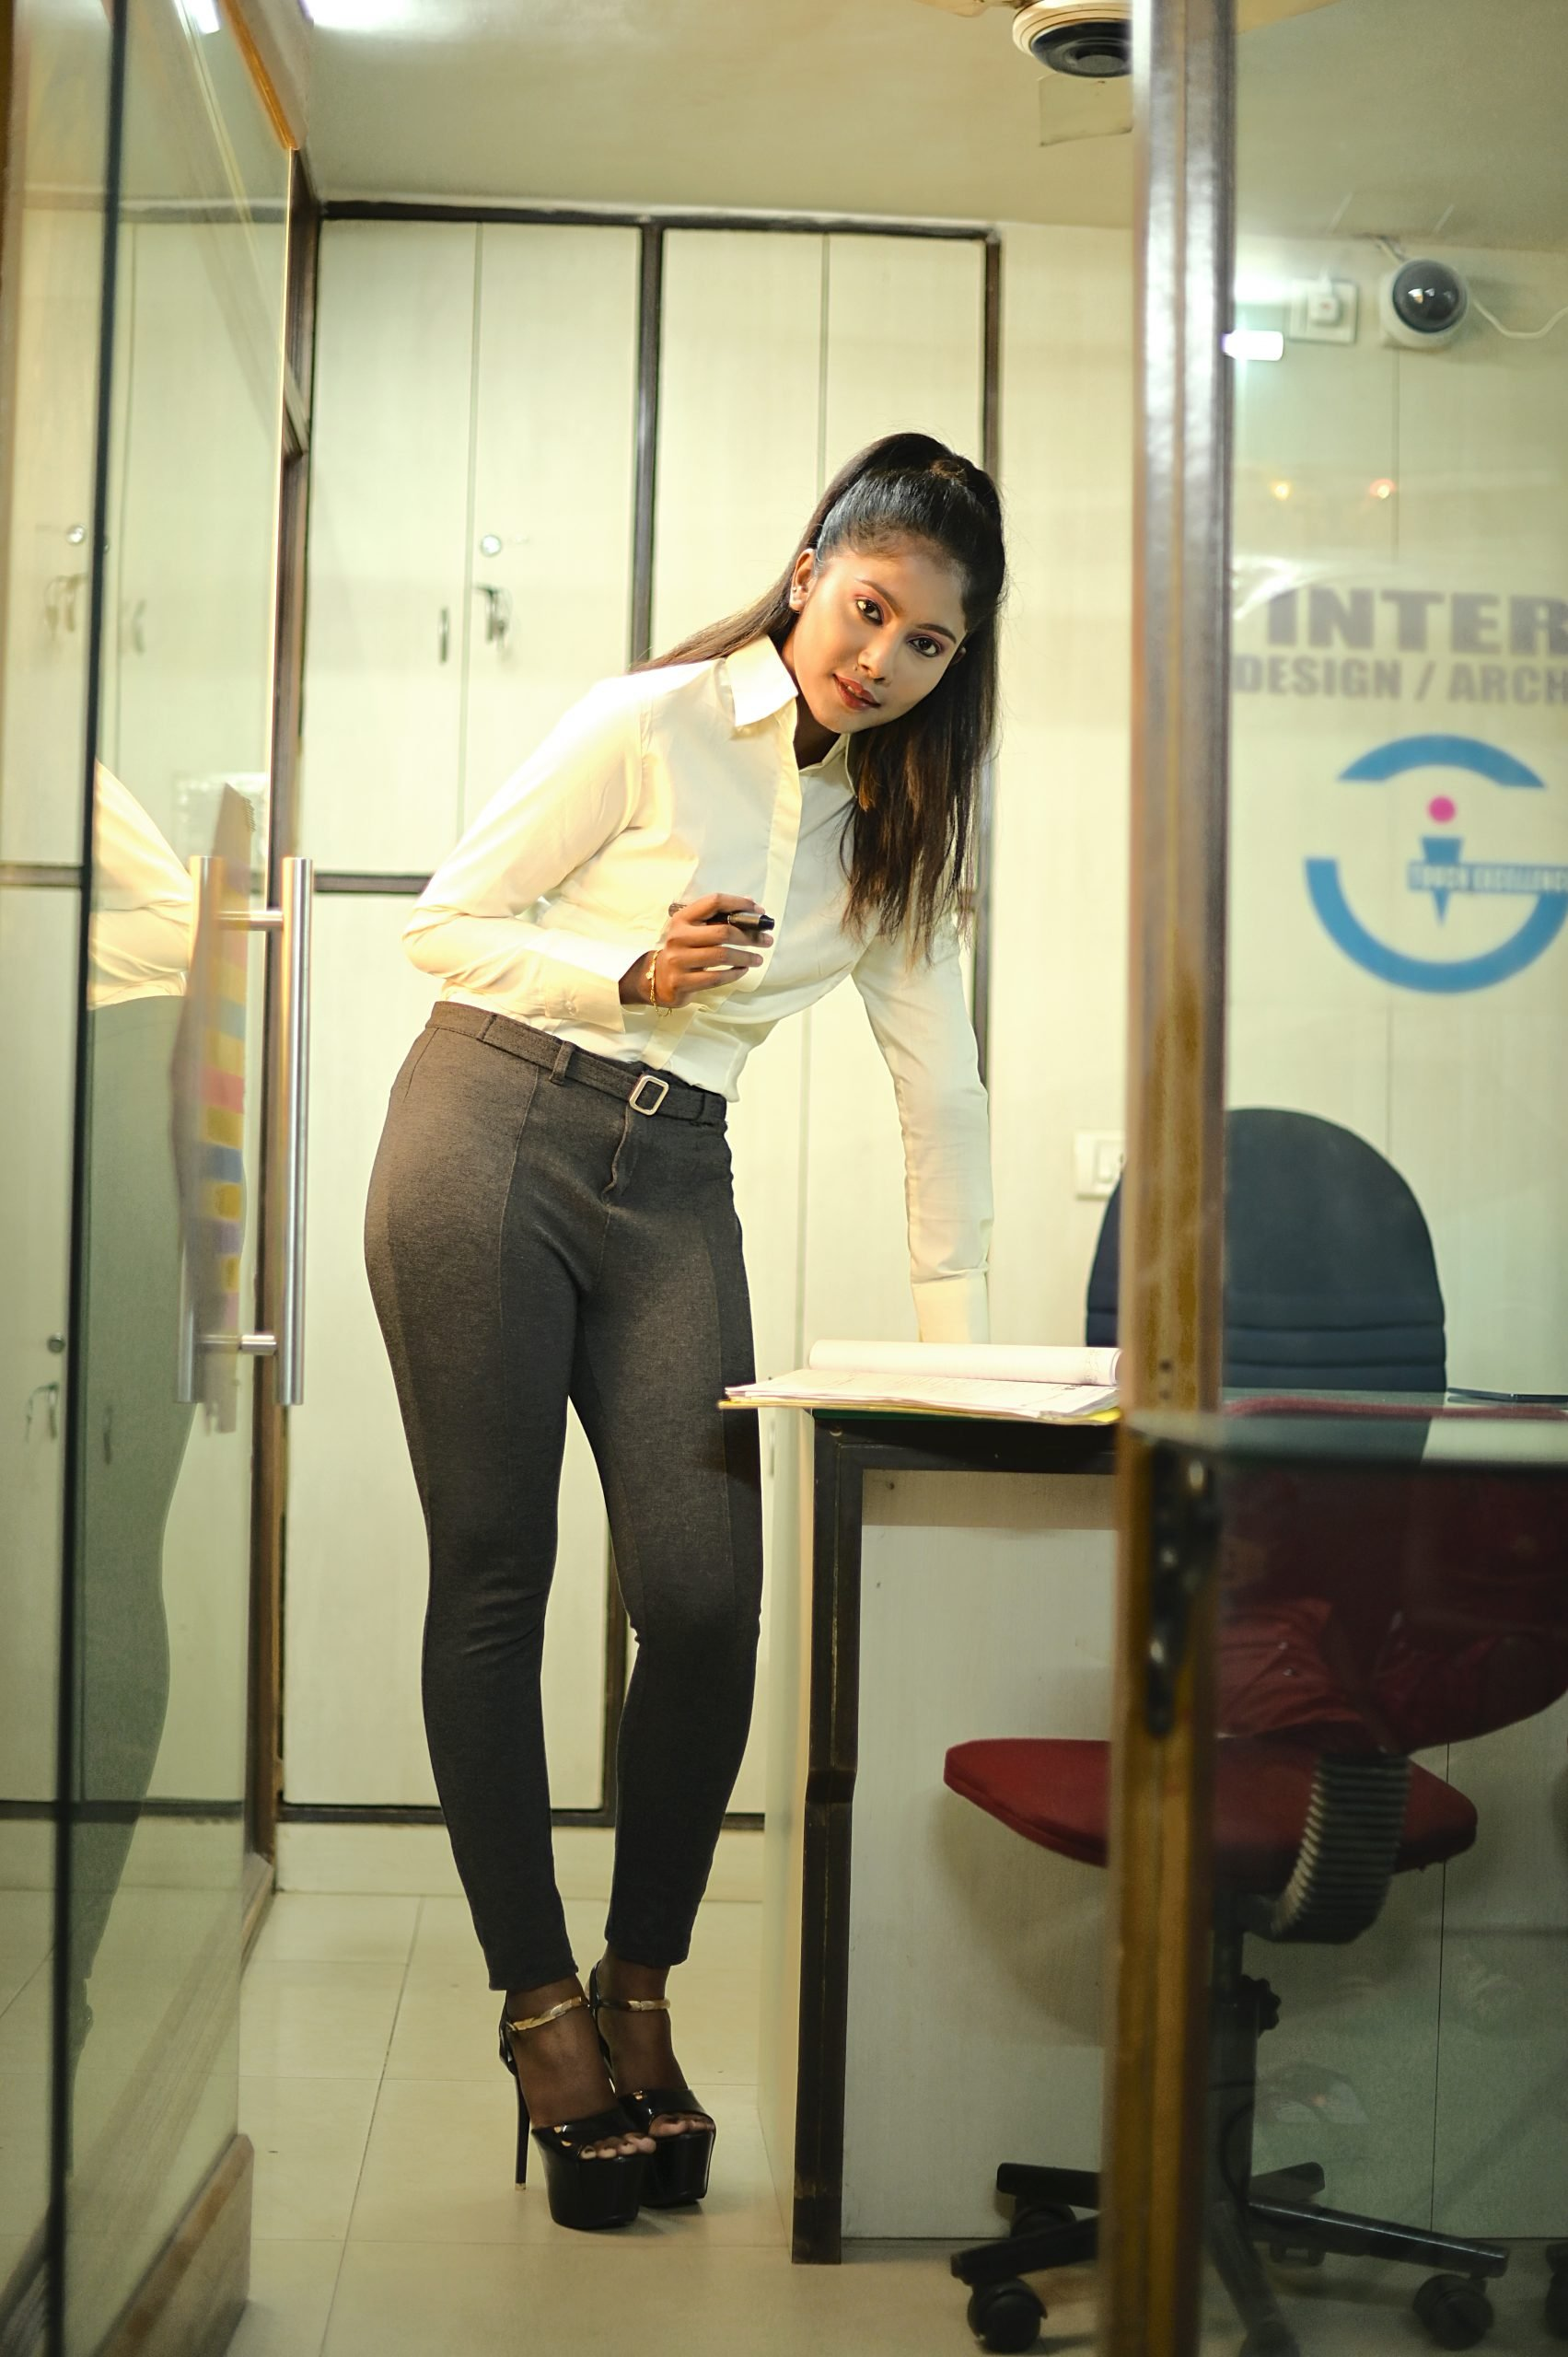 Girl posing in the office